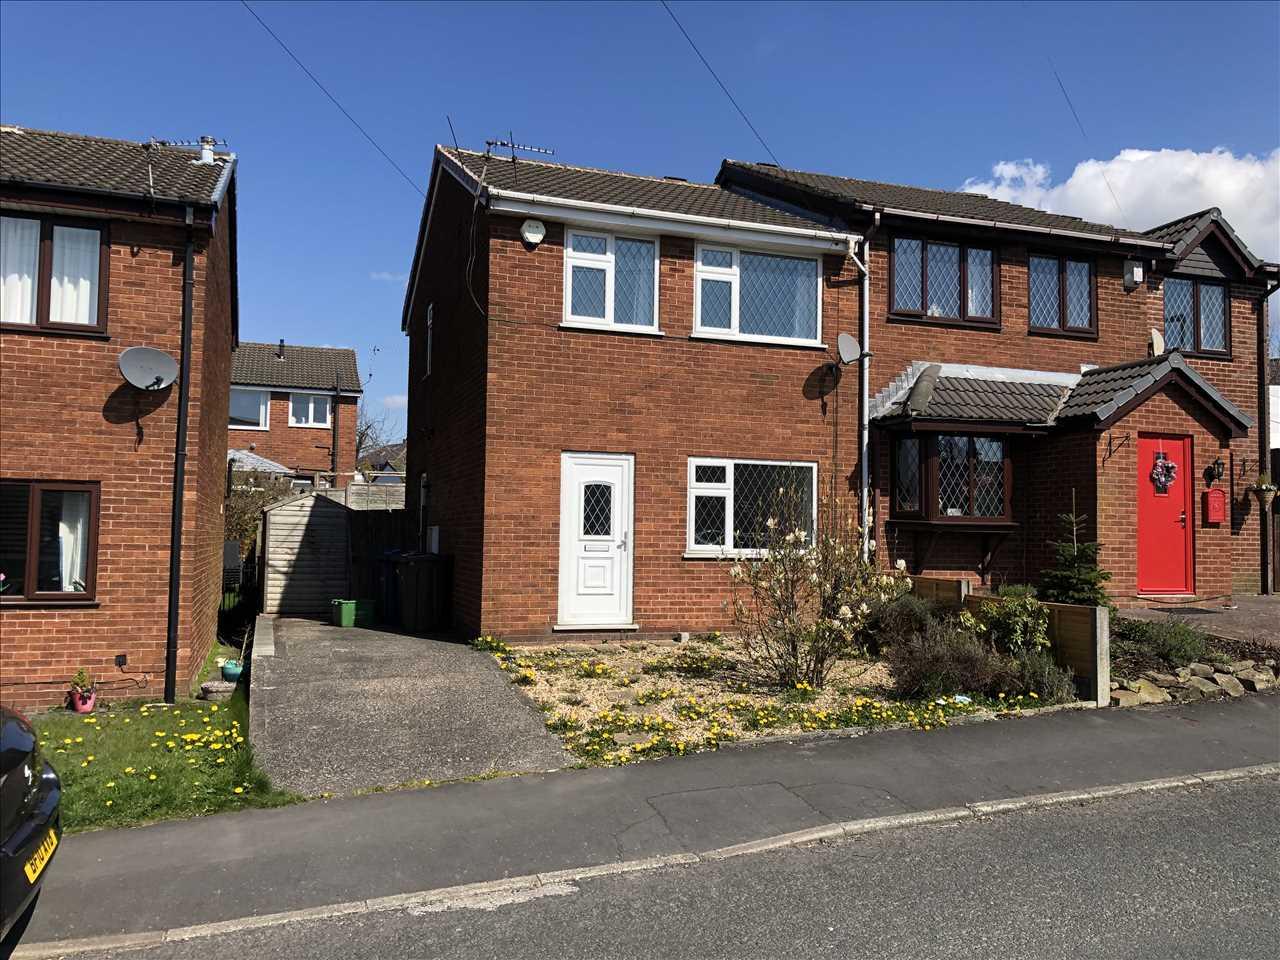 2 bed semi-detached for sale in Rawlinson Lane, Heath Charnock, PR6